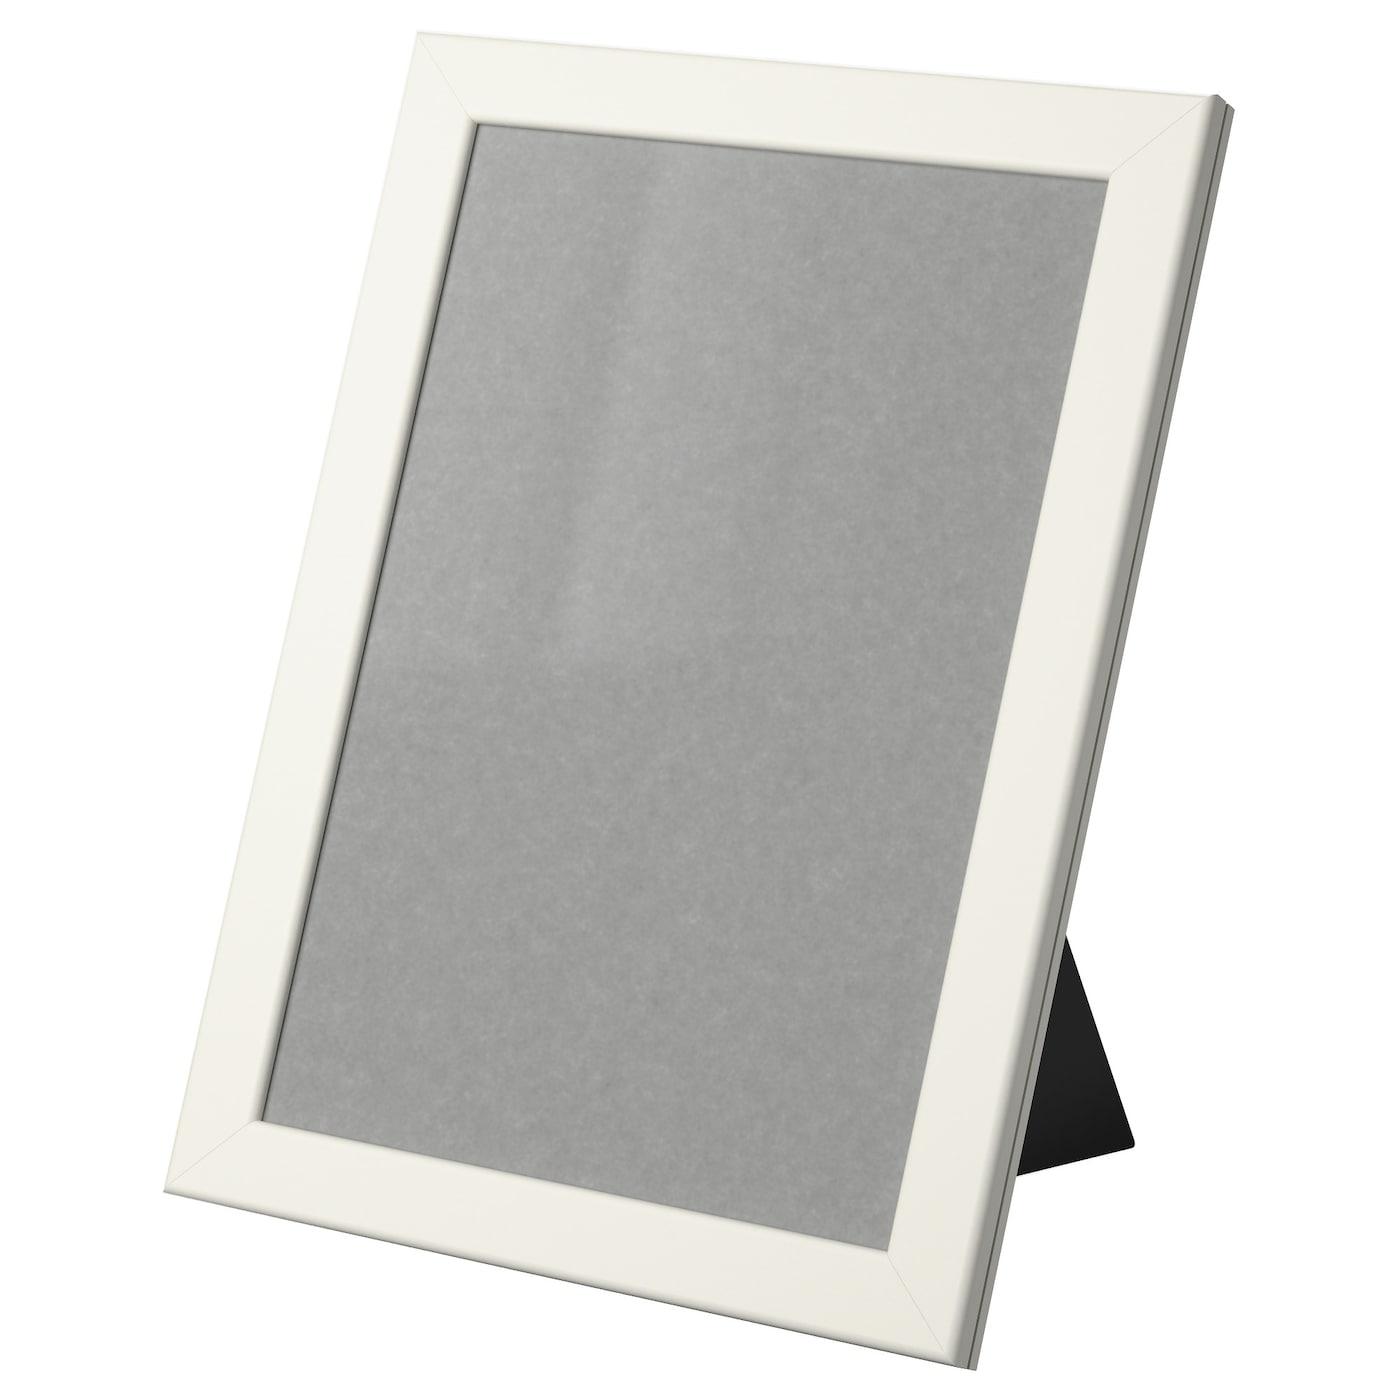 hemmingsbo front opening picture frame white 21x30 cm ikea. Black Bedroom Furniture Sets. Home Design Ideas